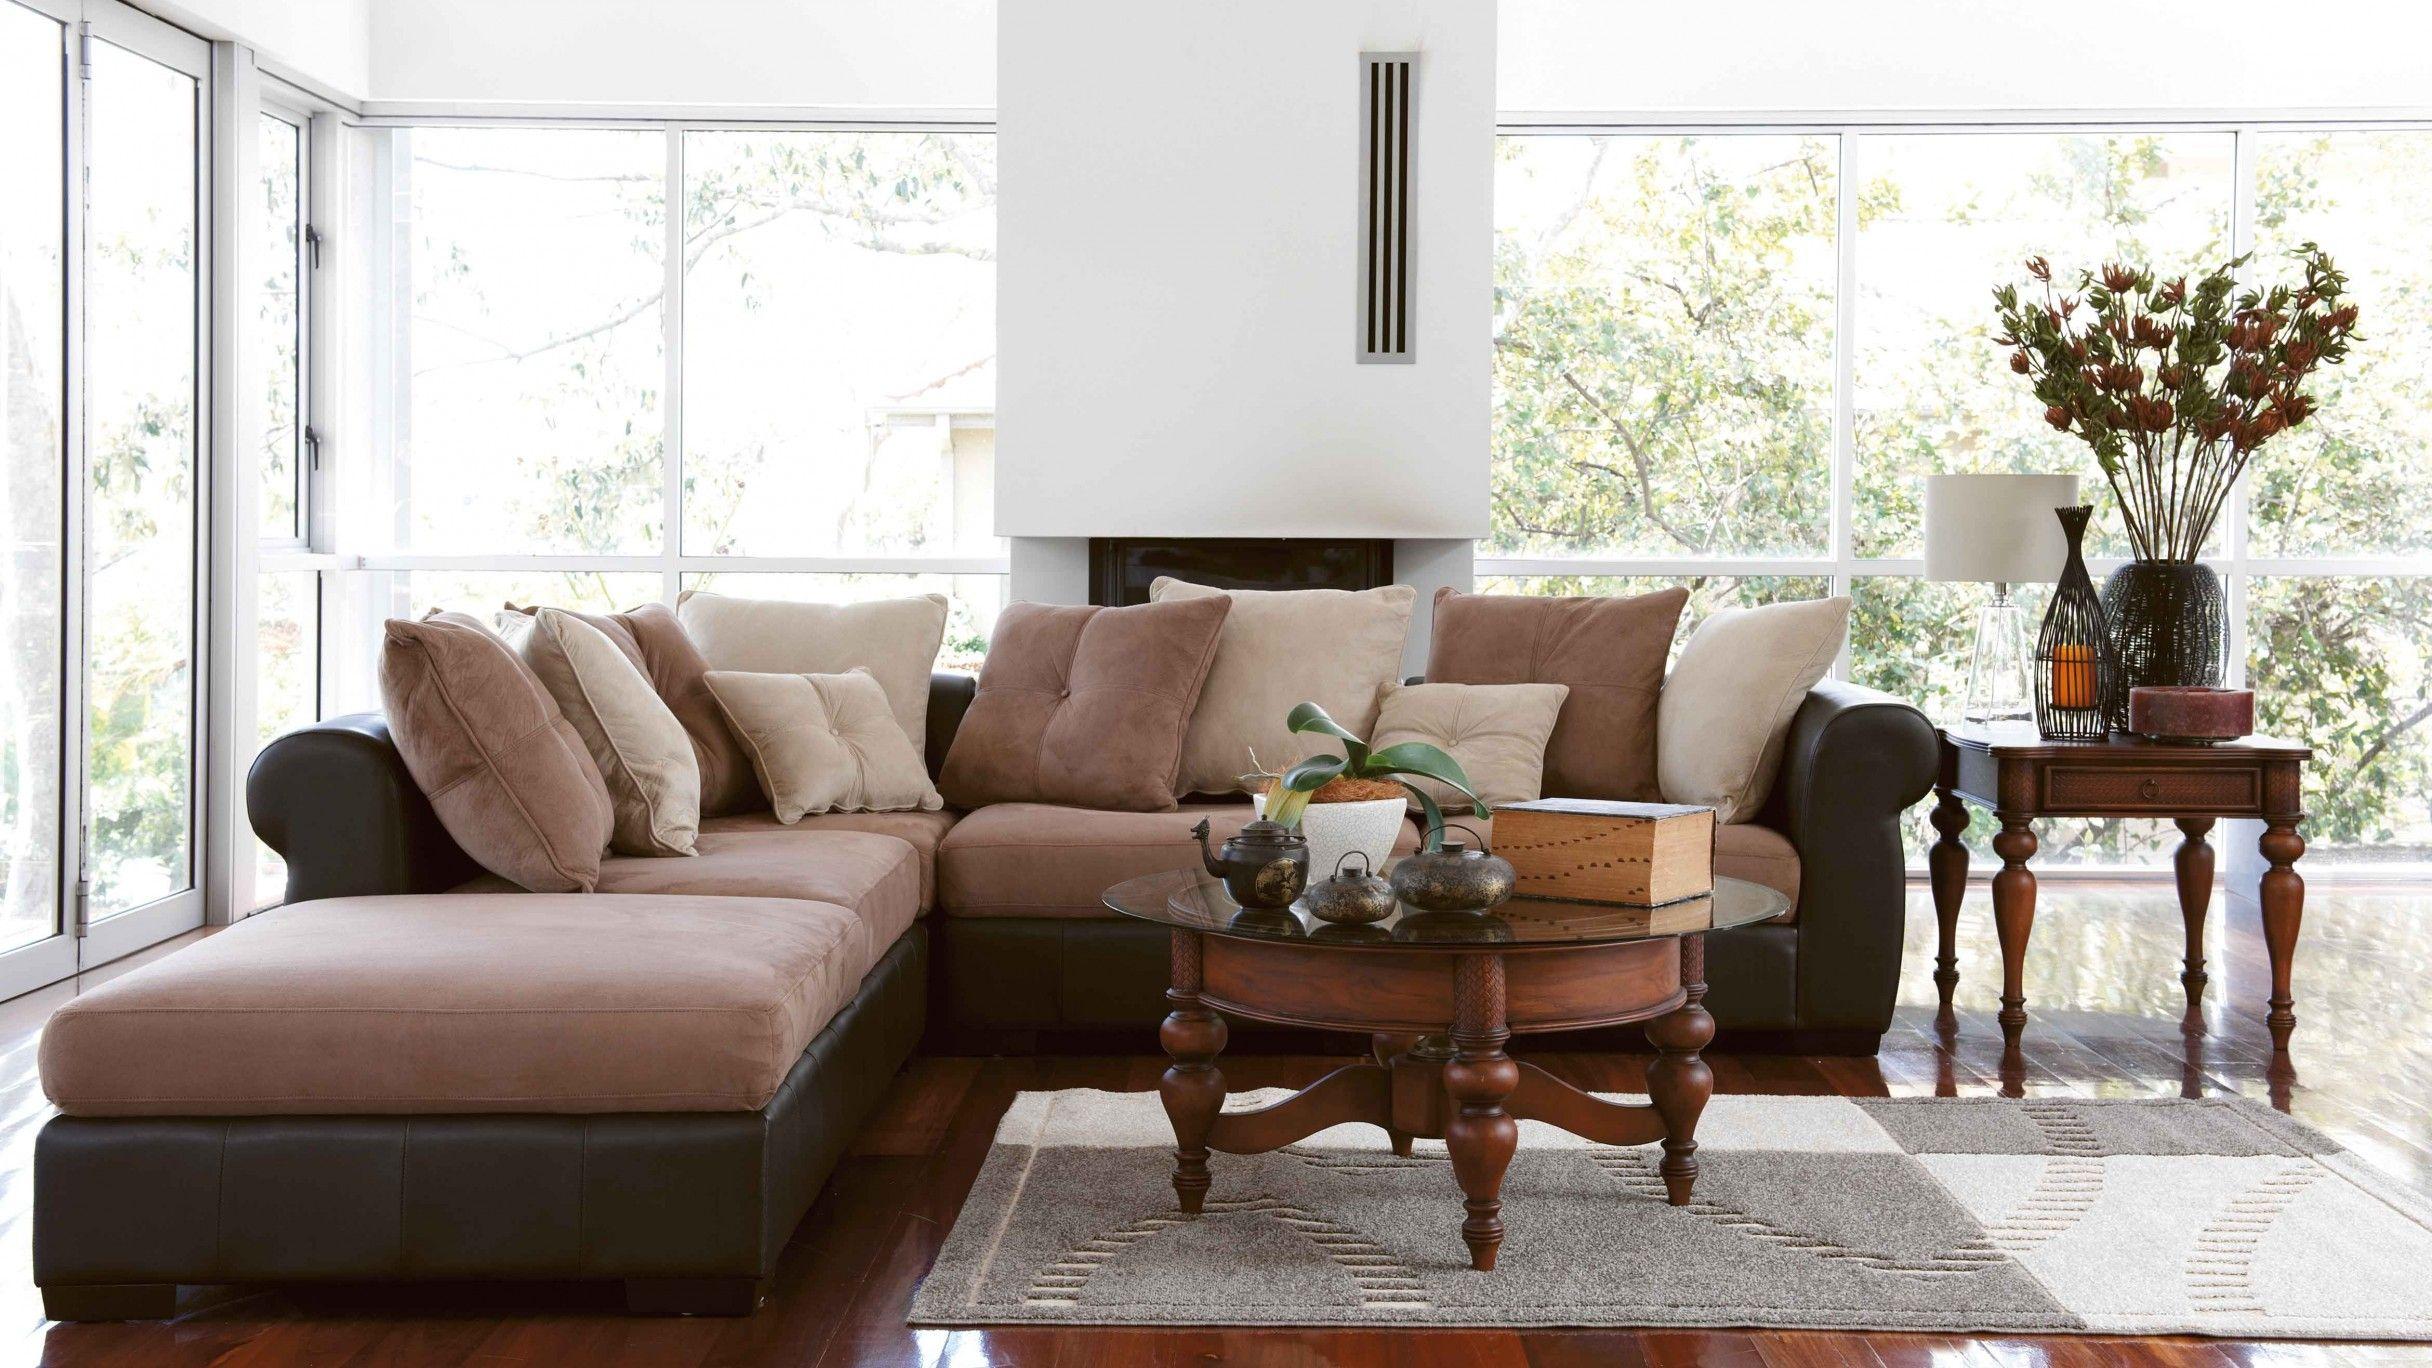 cooper sofa harvey norman 2 piece slipcover mojo 5 modular lounge 2499 april 2012